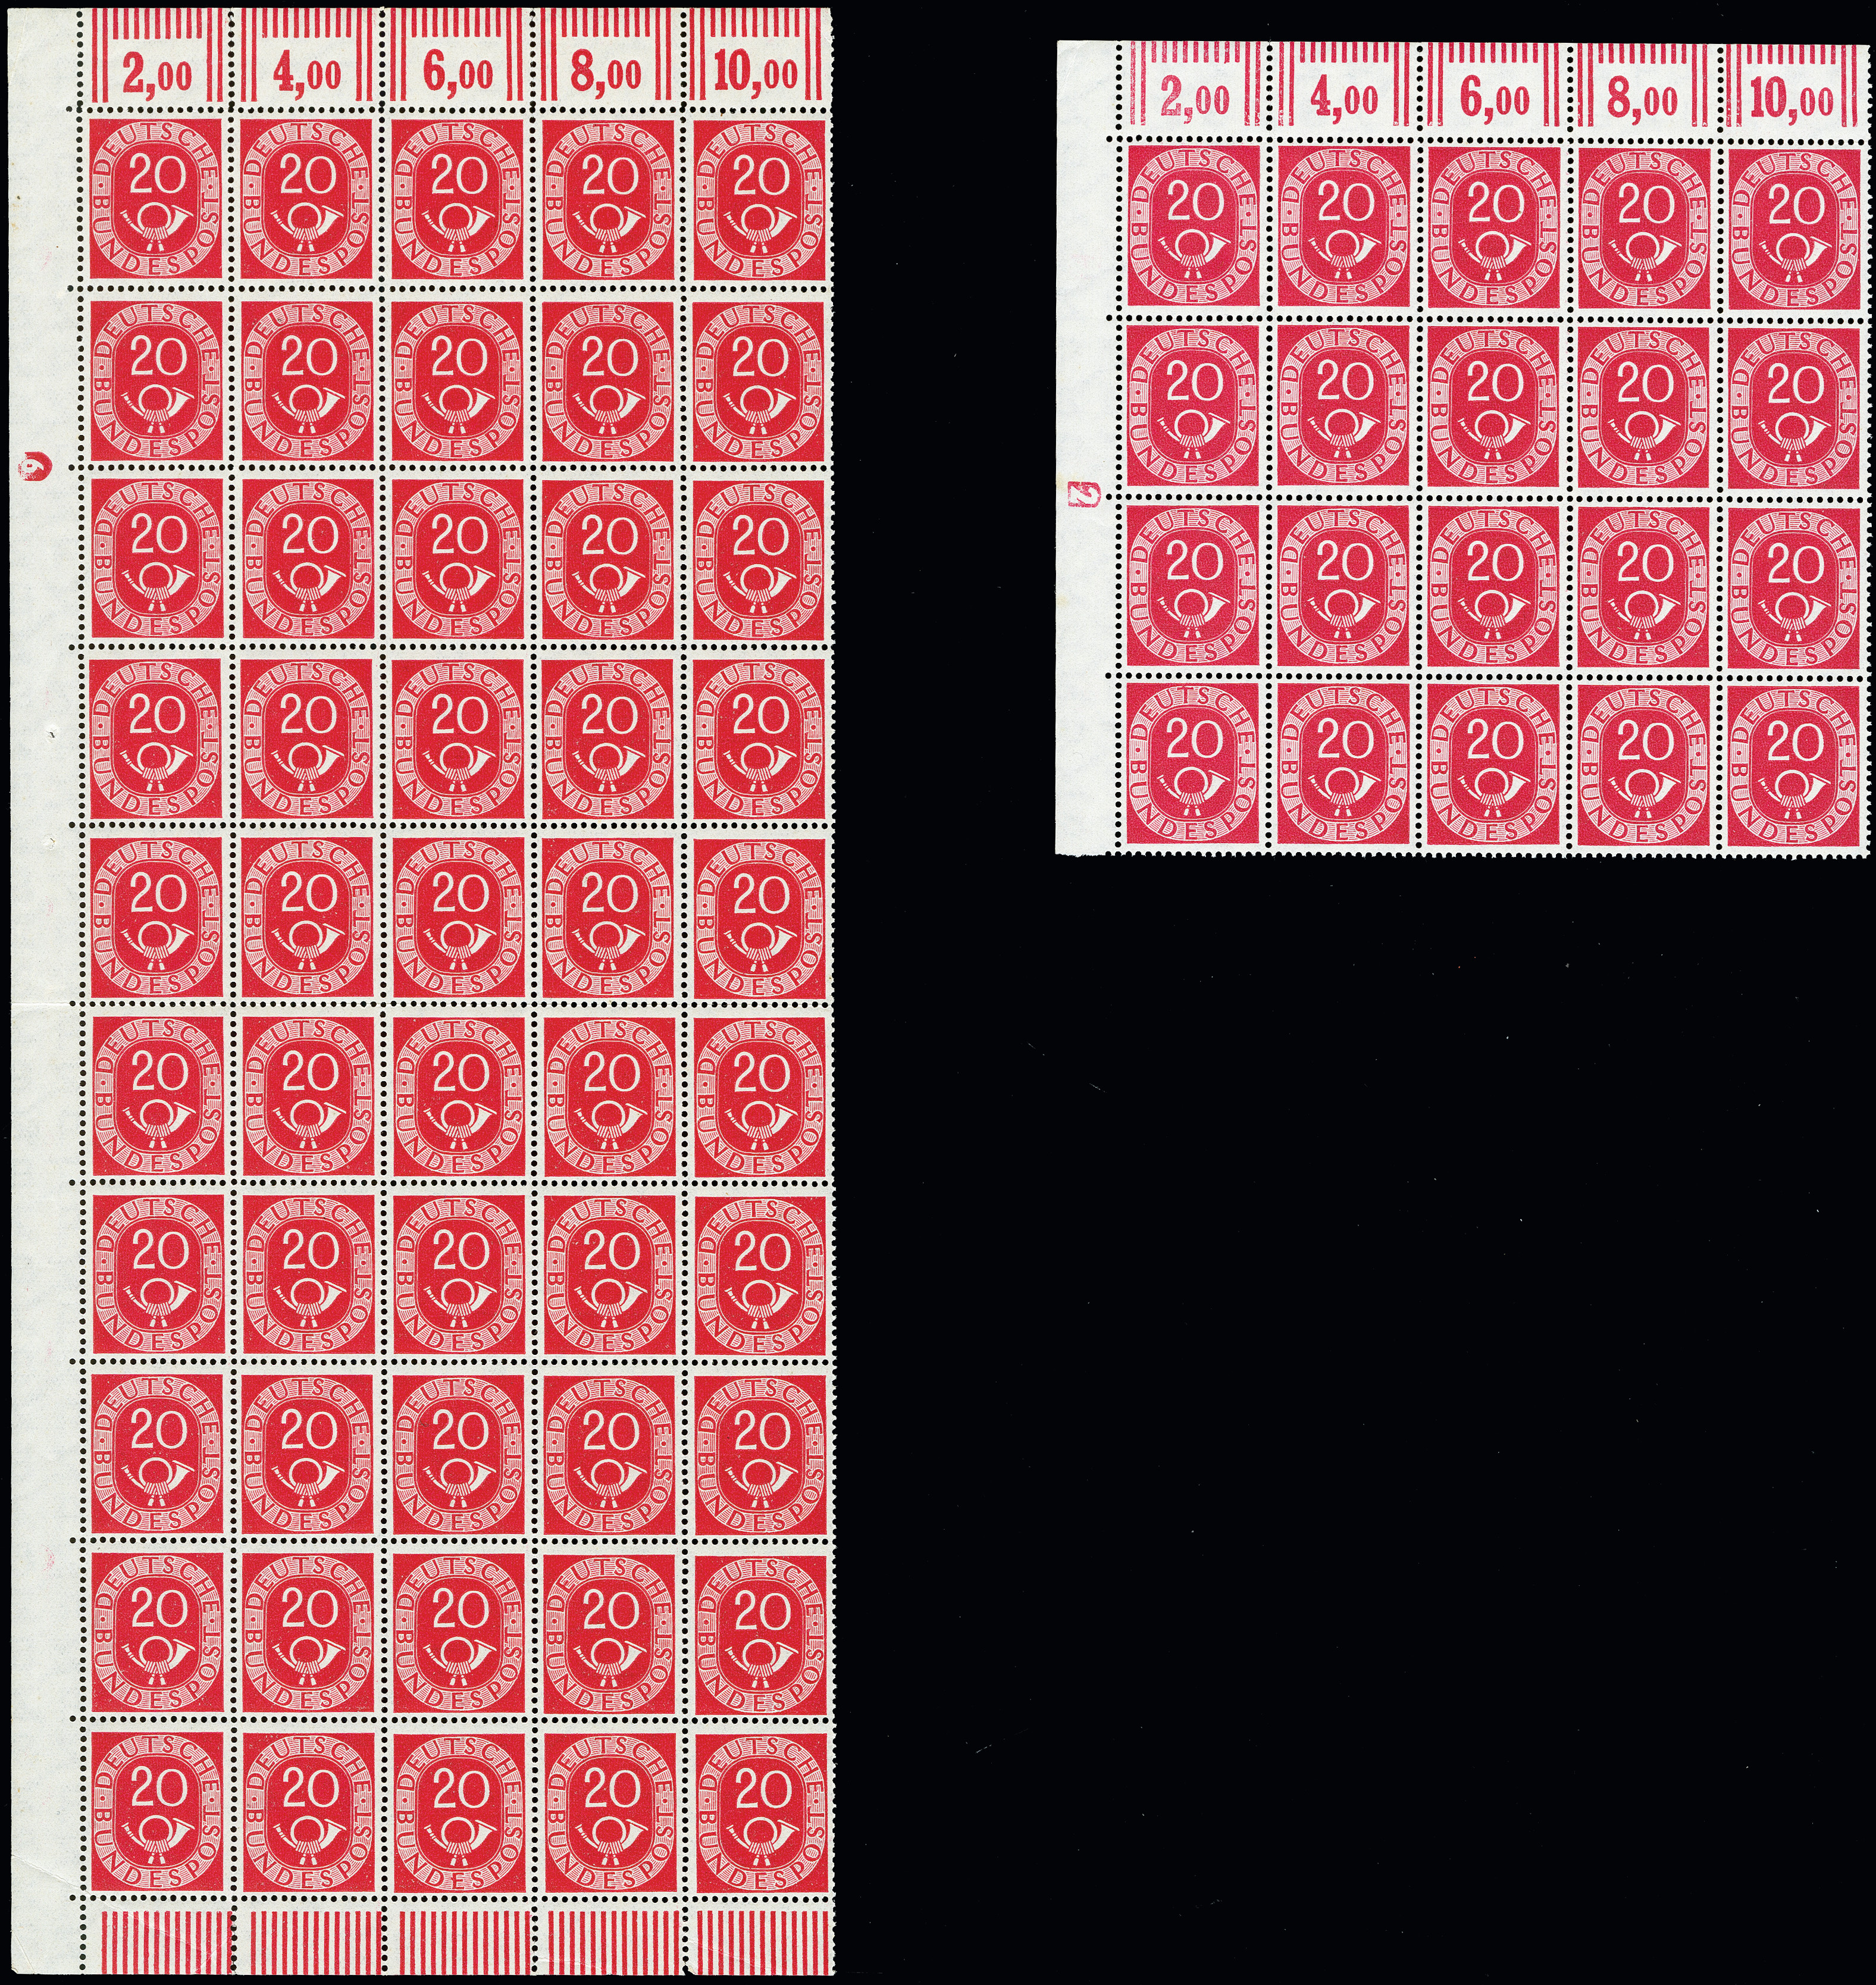 Lot 2498 - germany after 1945 federal republic of germany -  Heinrich Koehler Auktionen 373rd Heinrich Köhler auction - Day 4